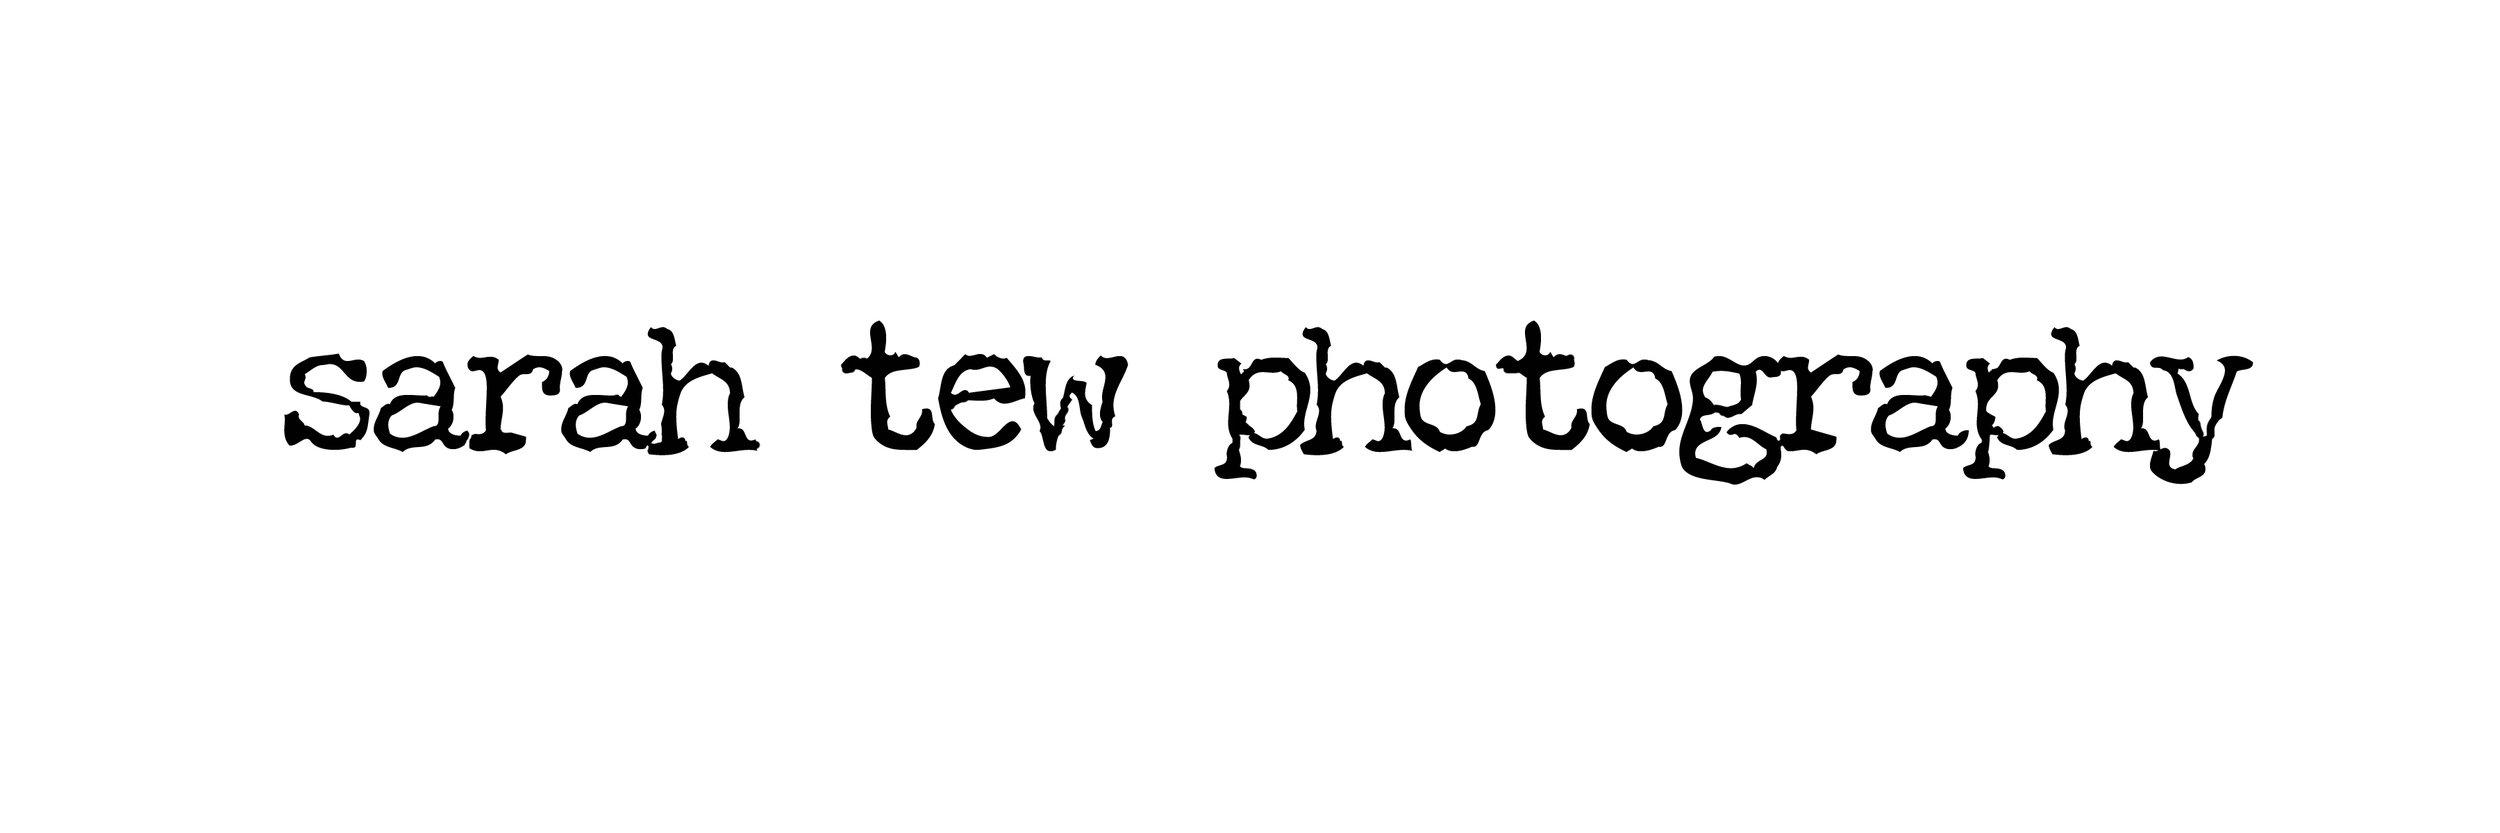 TEXTlogo-SarahTewPhotography-p22.jpg